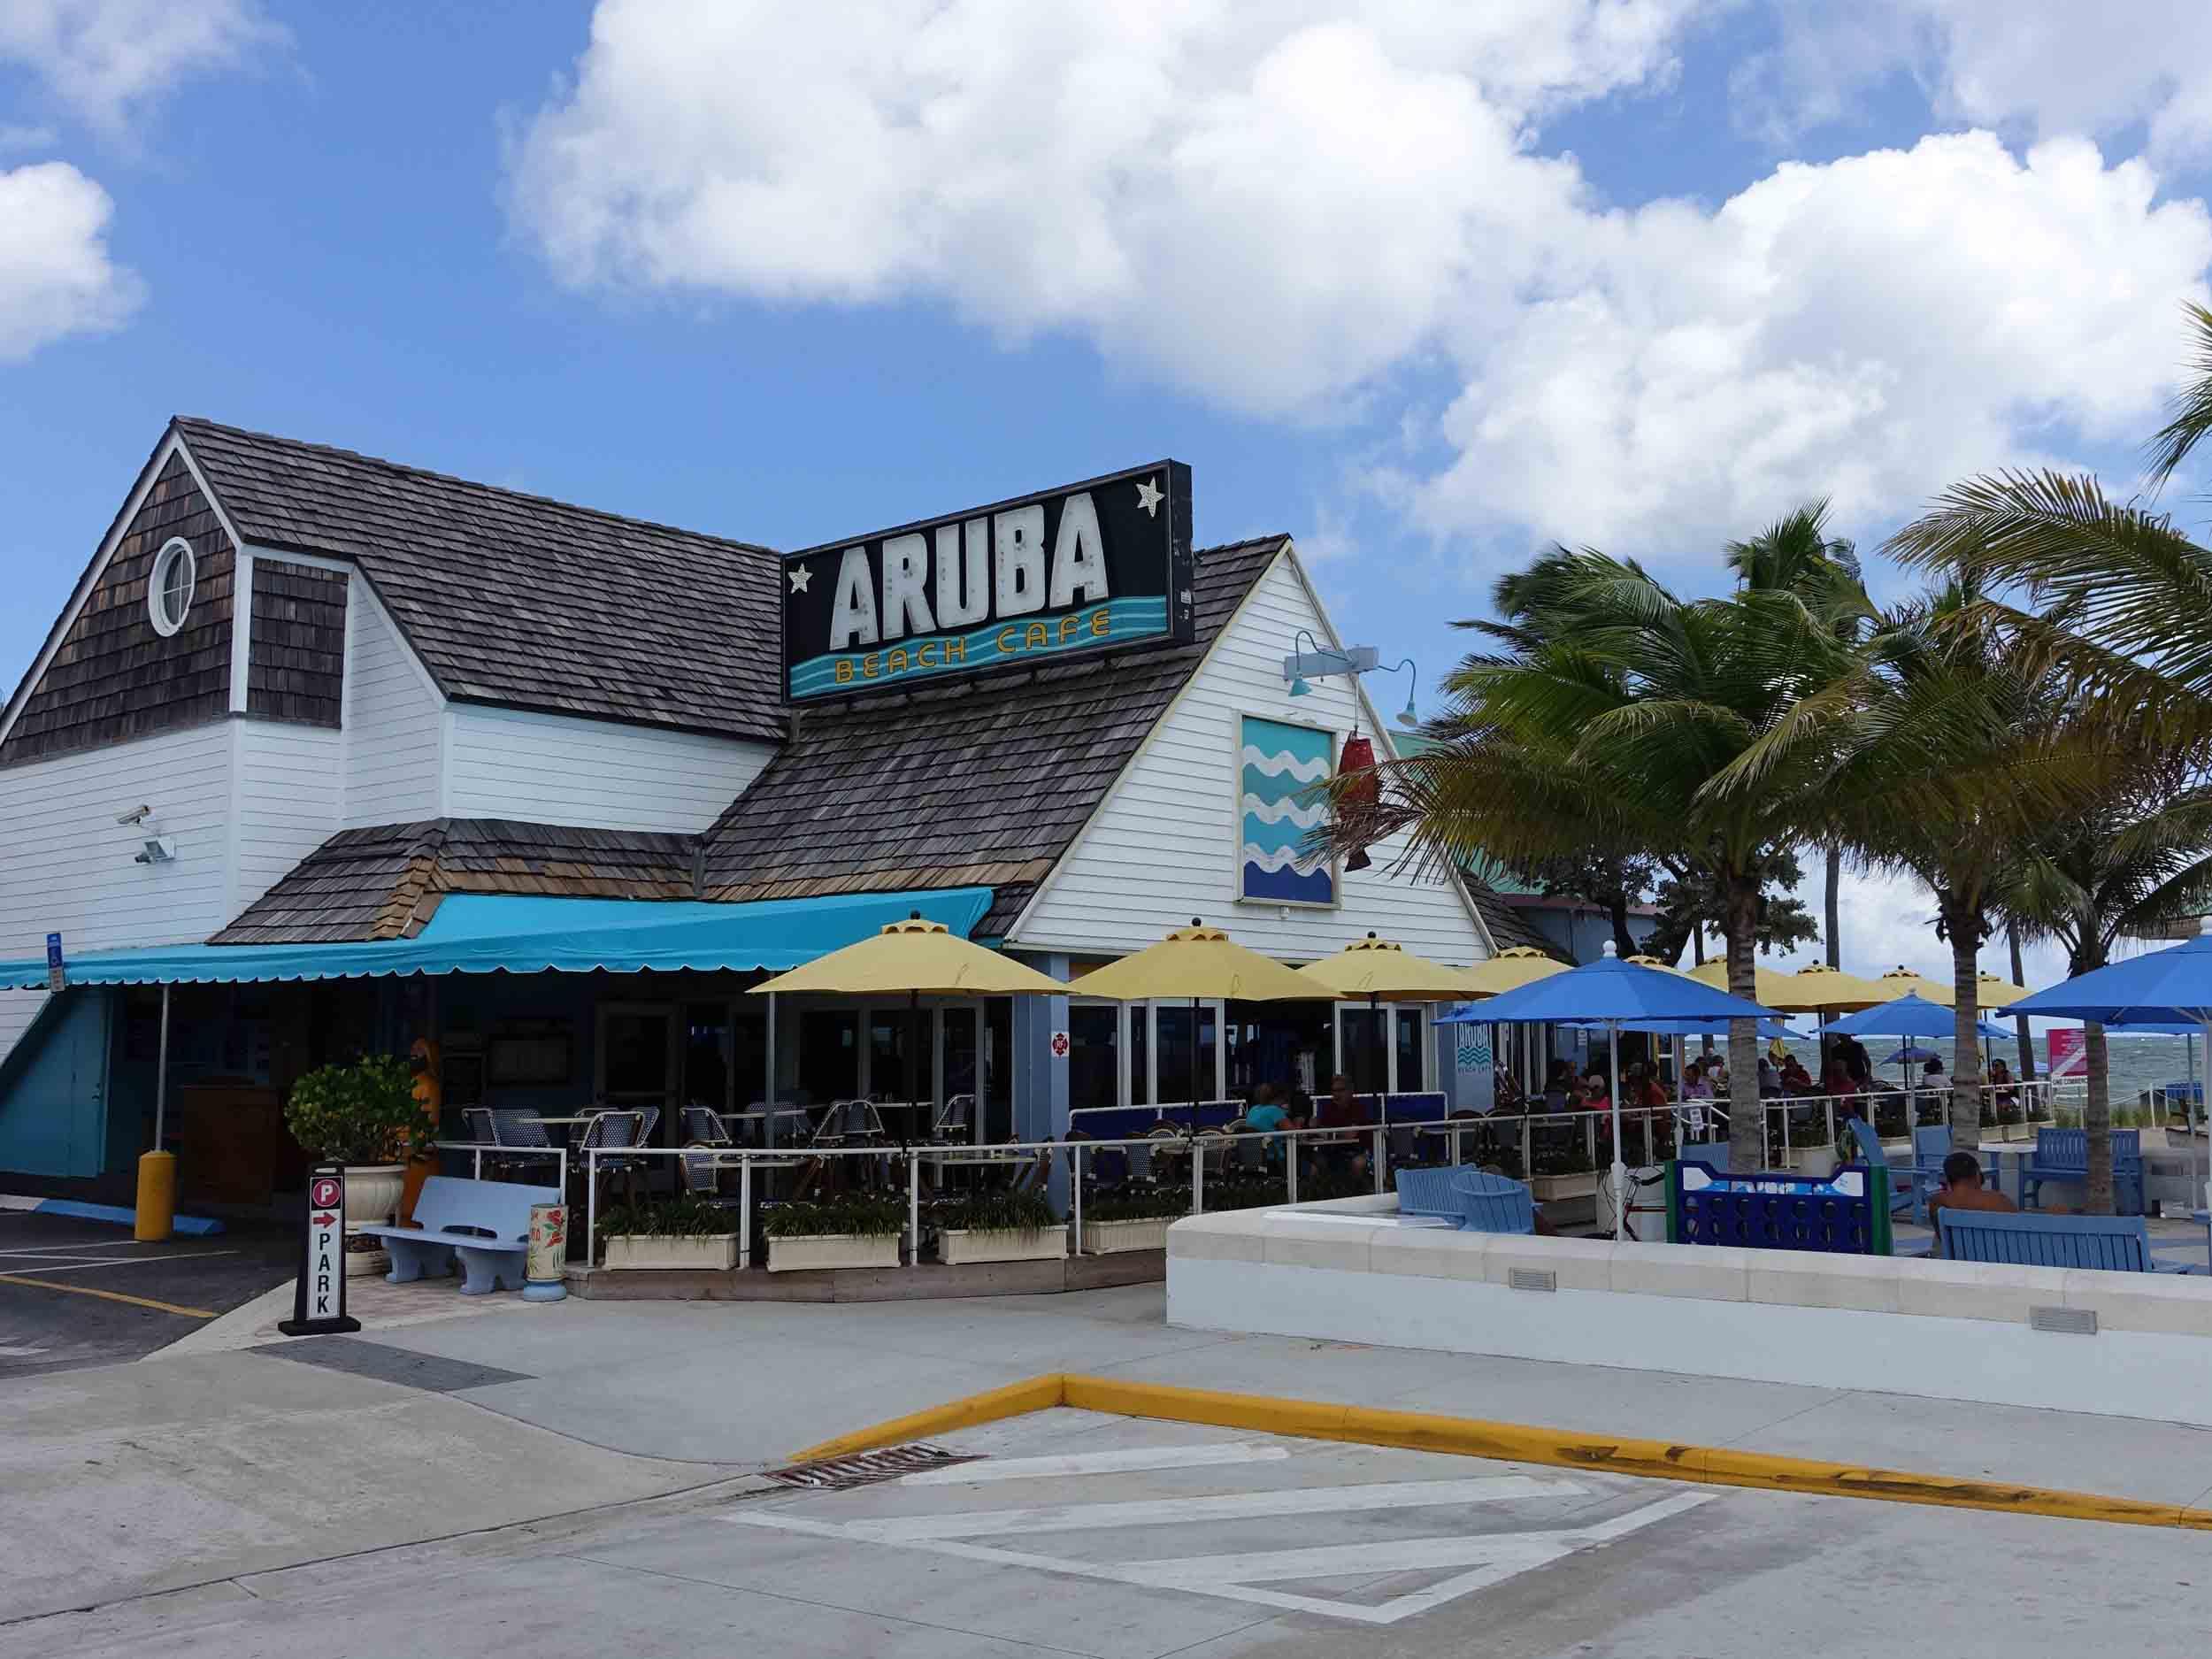 Aruba Beach Cafe Exterior